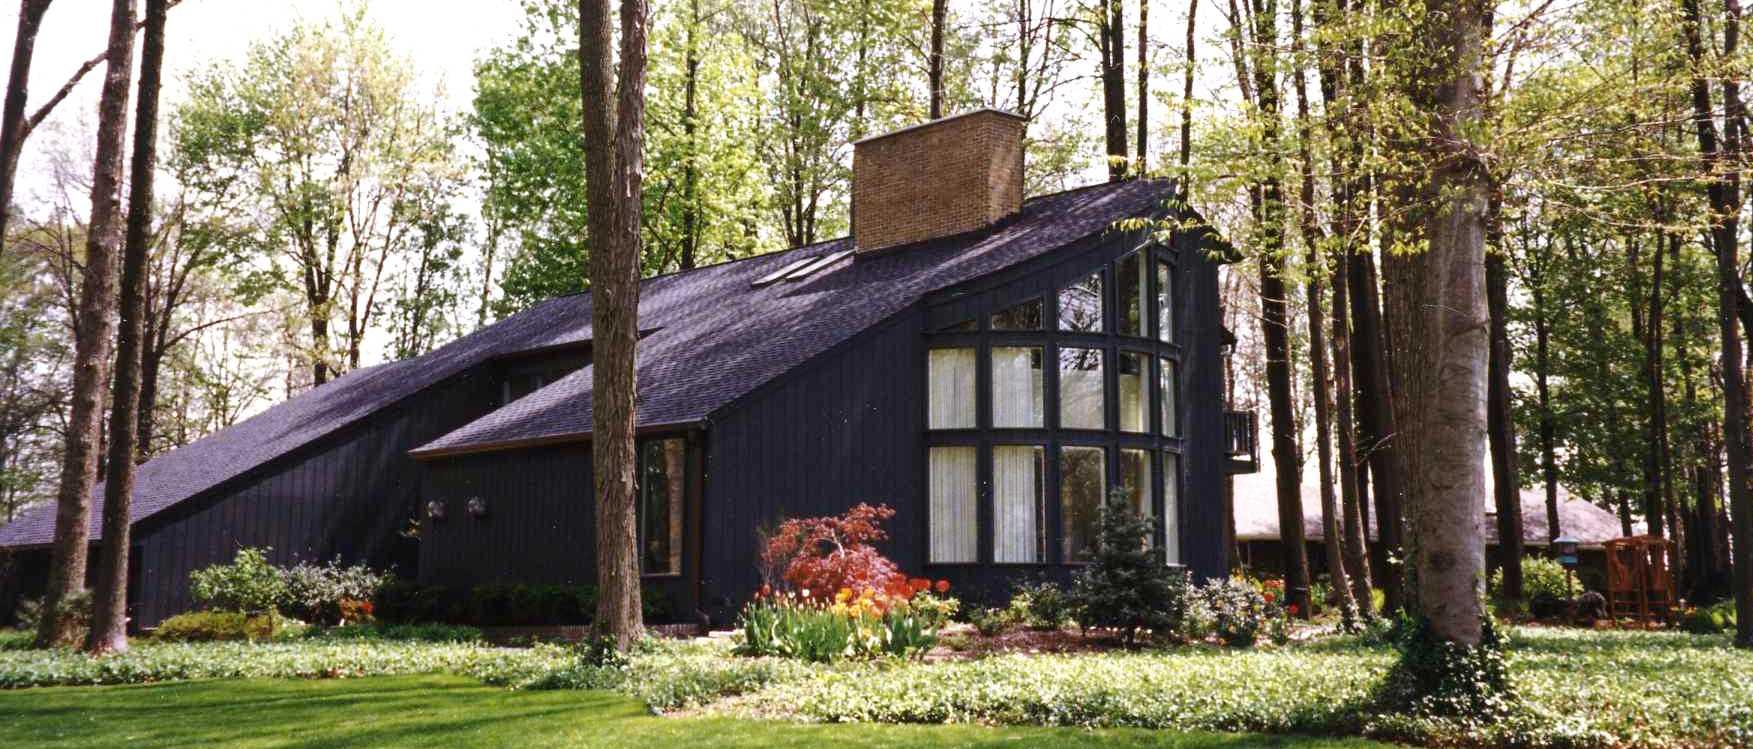 1994 Wilkins Home Addition.jpg